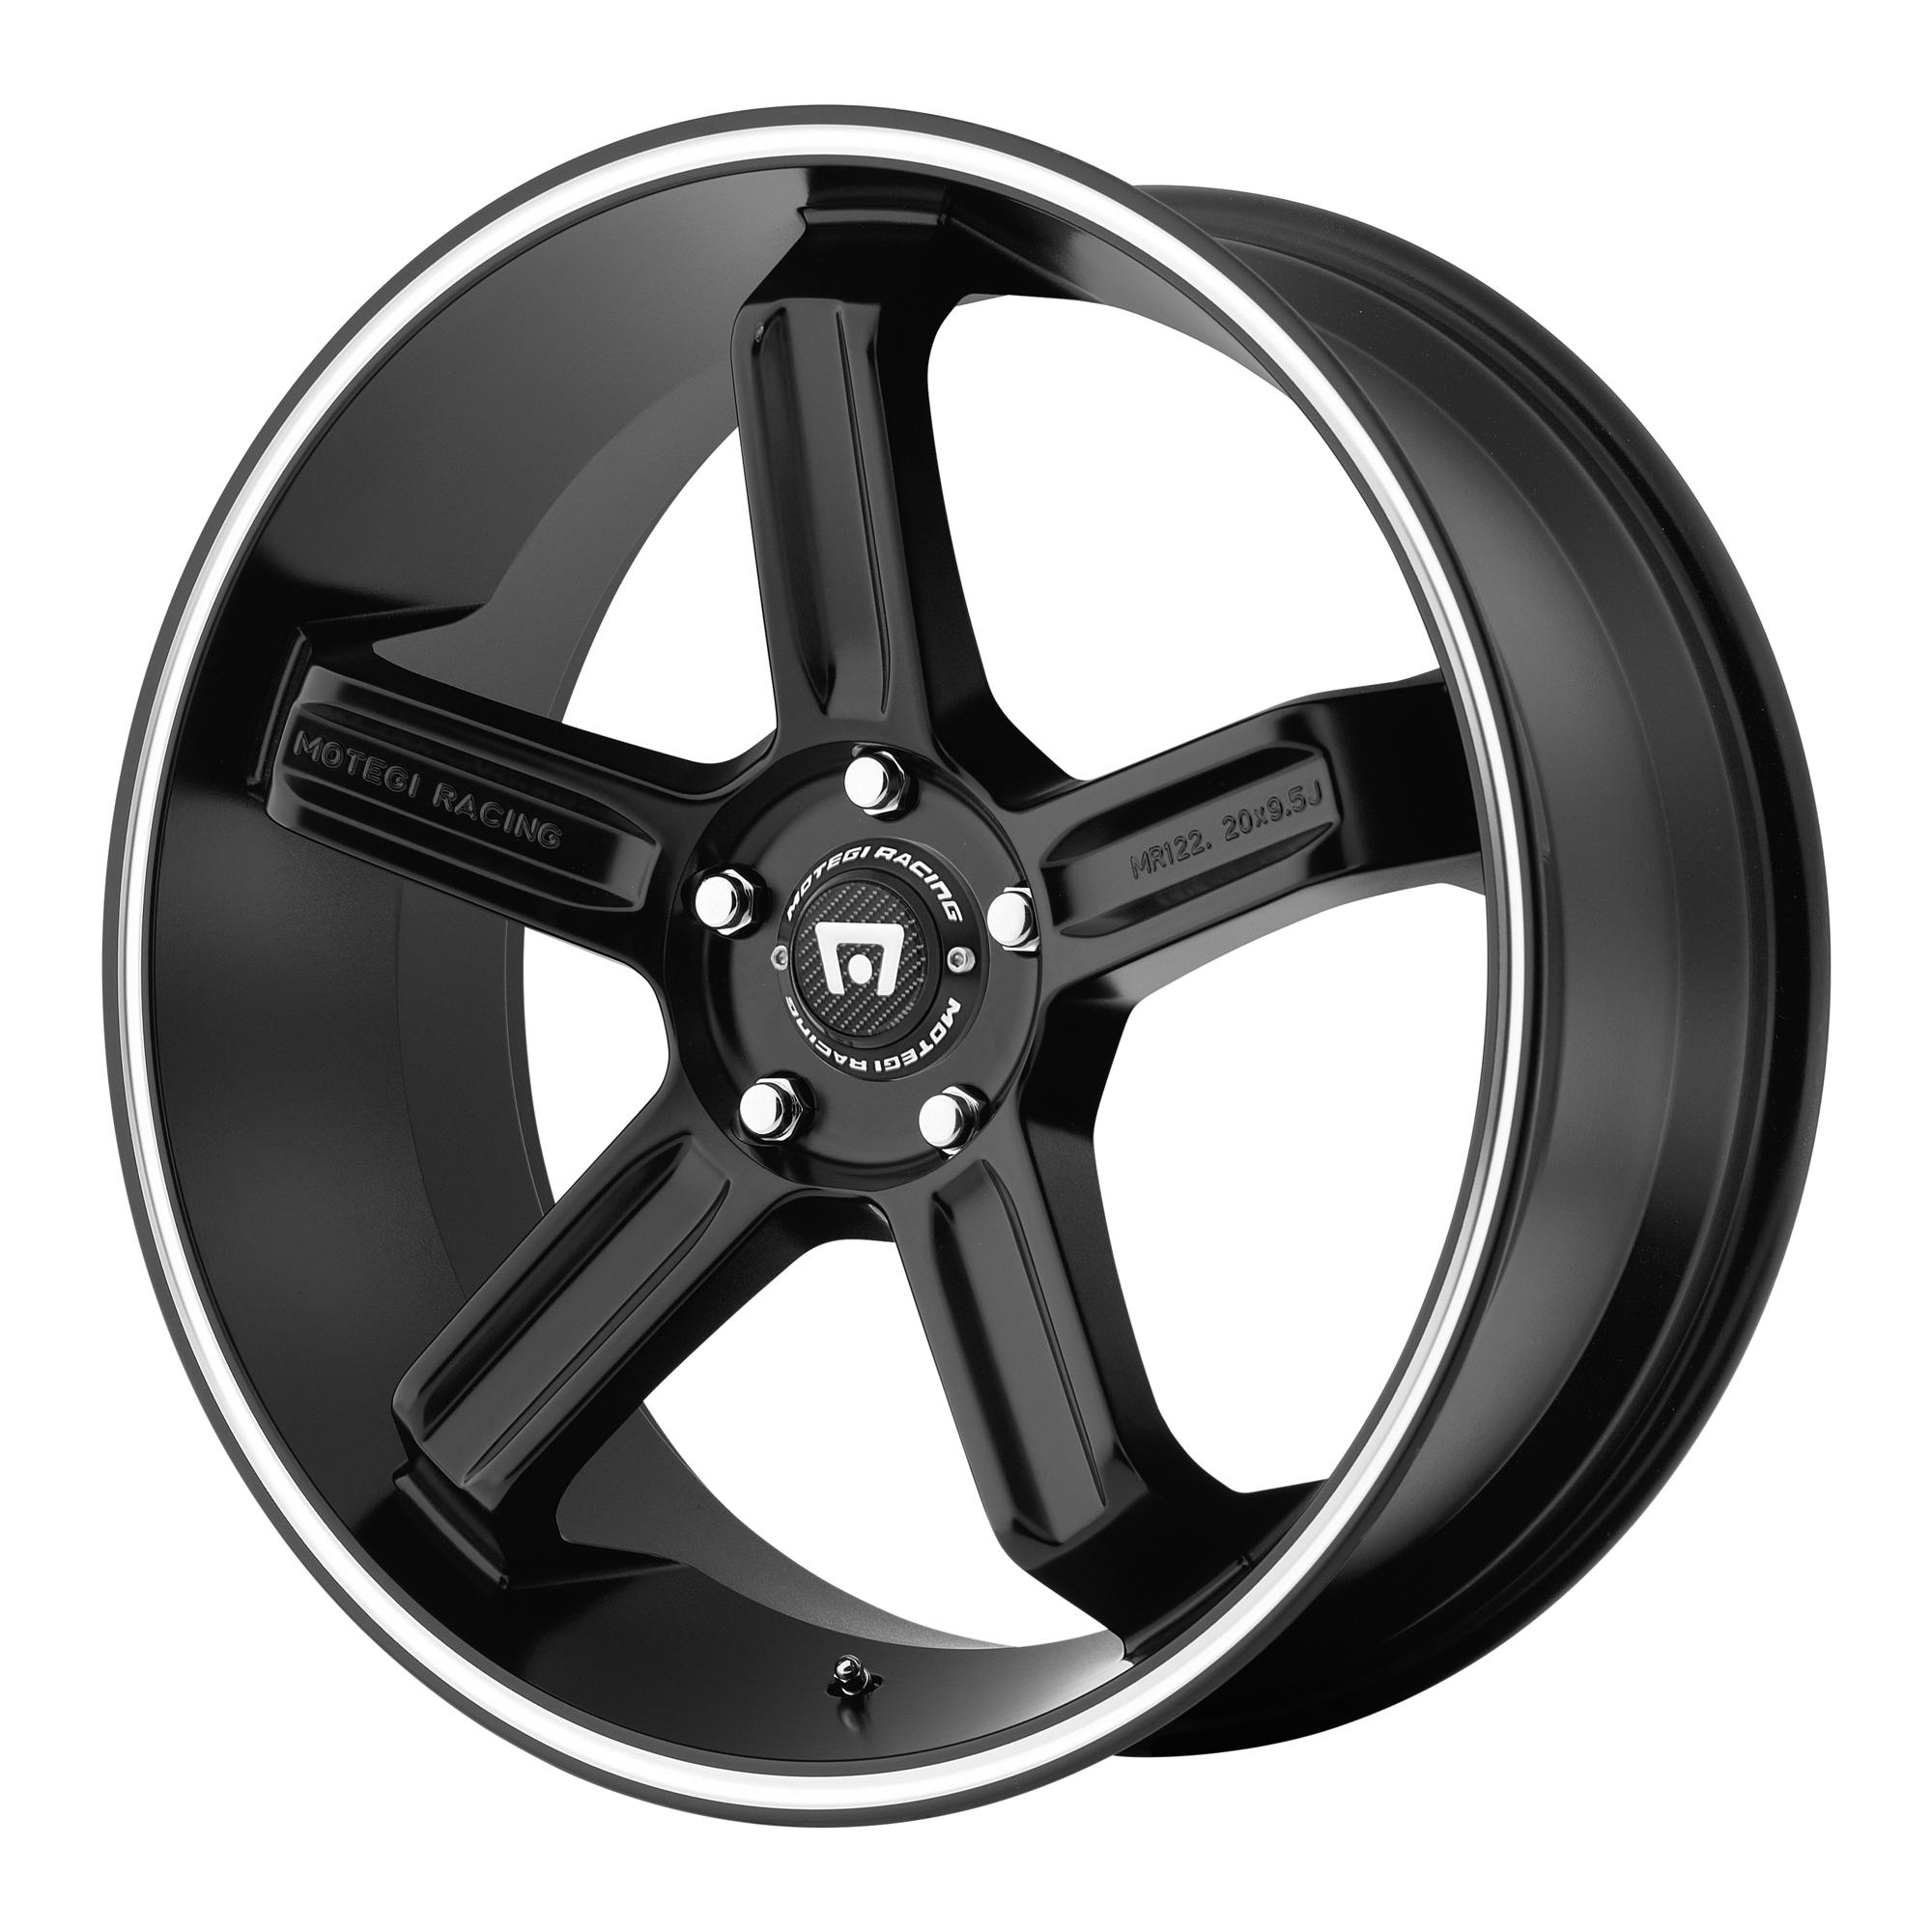 Motegi Racing Wheels MR122 Satin Black w/ Machined Stripe